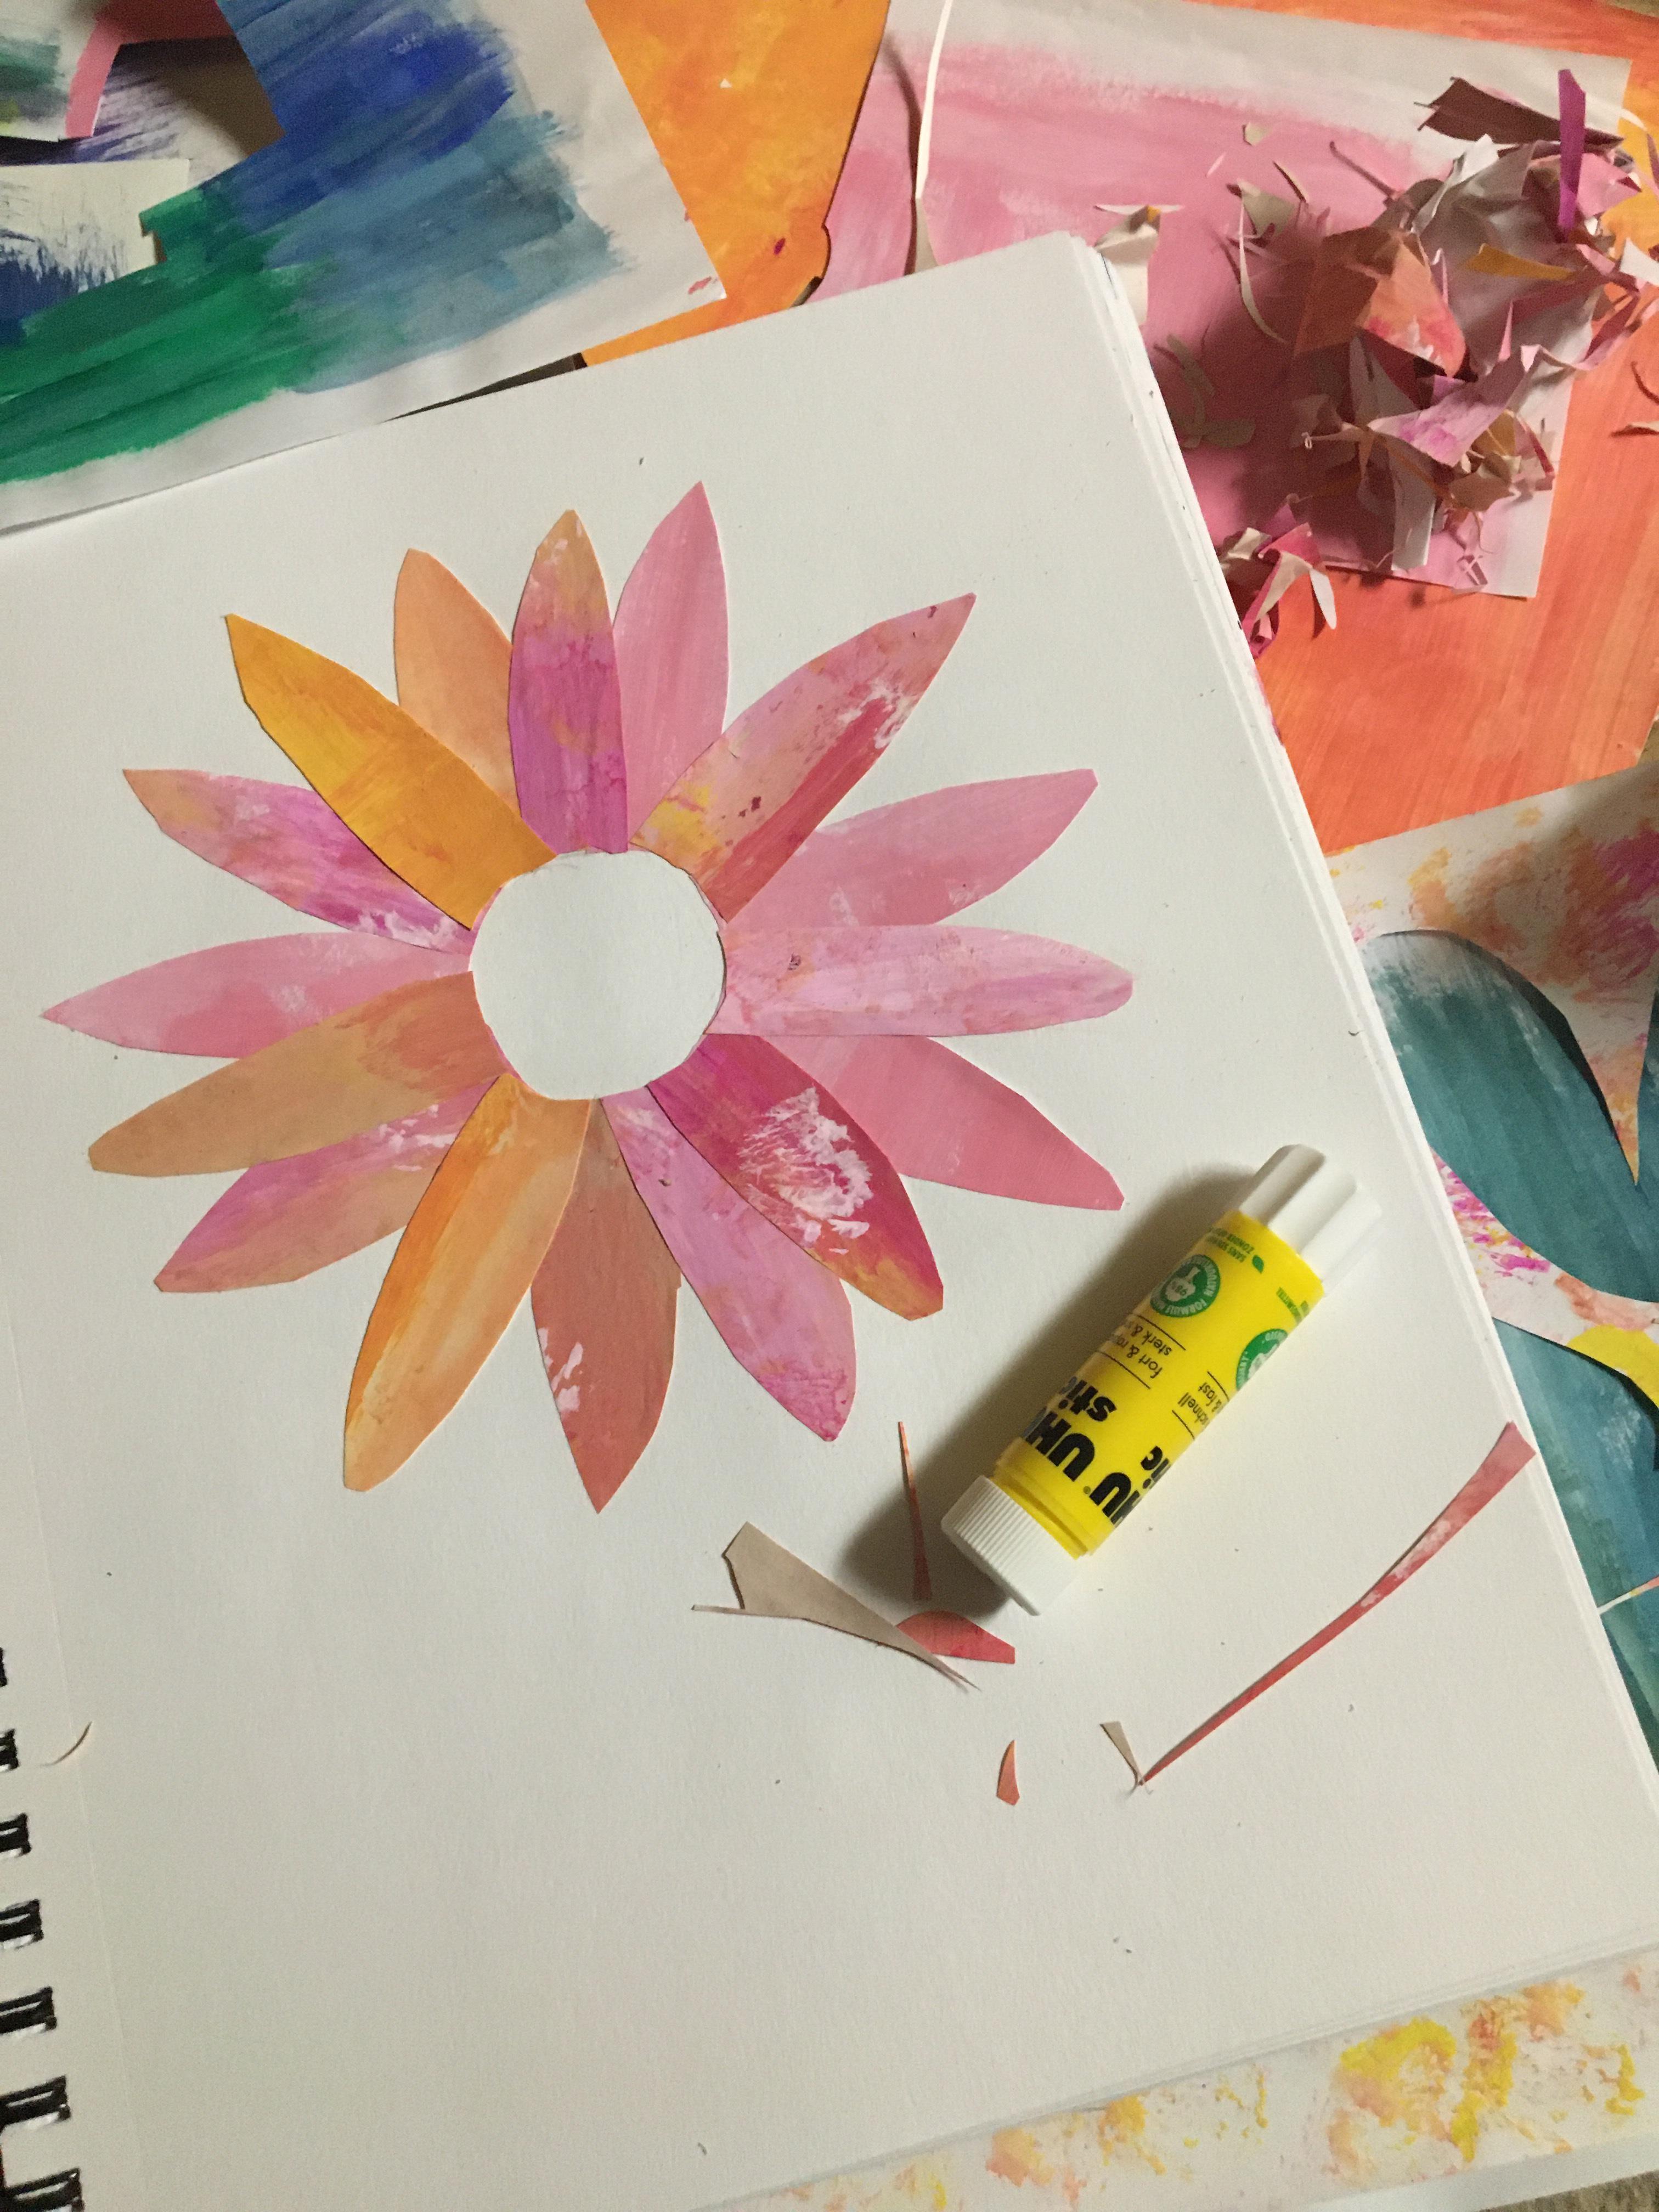 monotone pink and orange collage flower